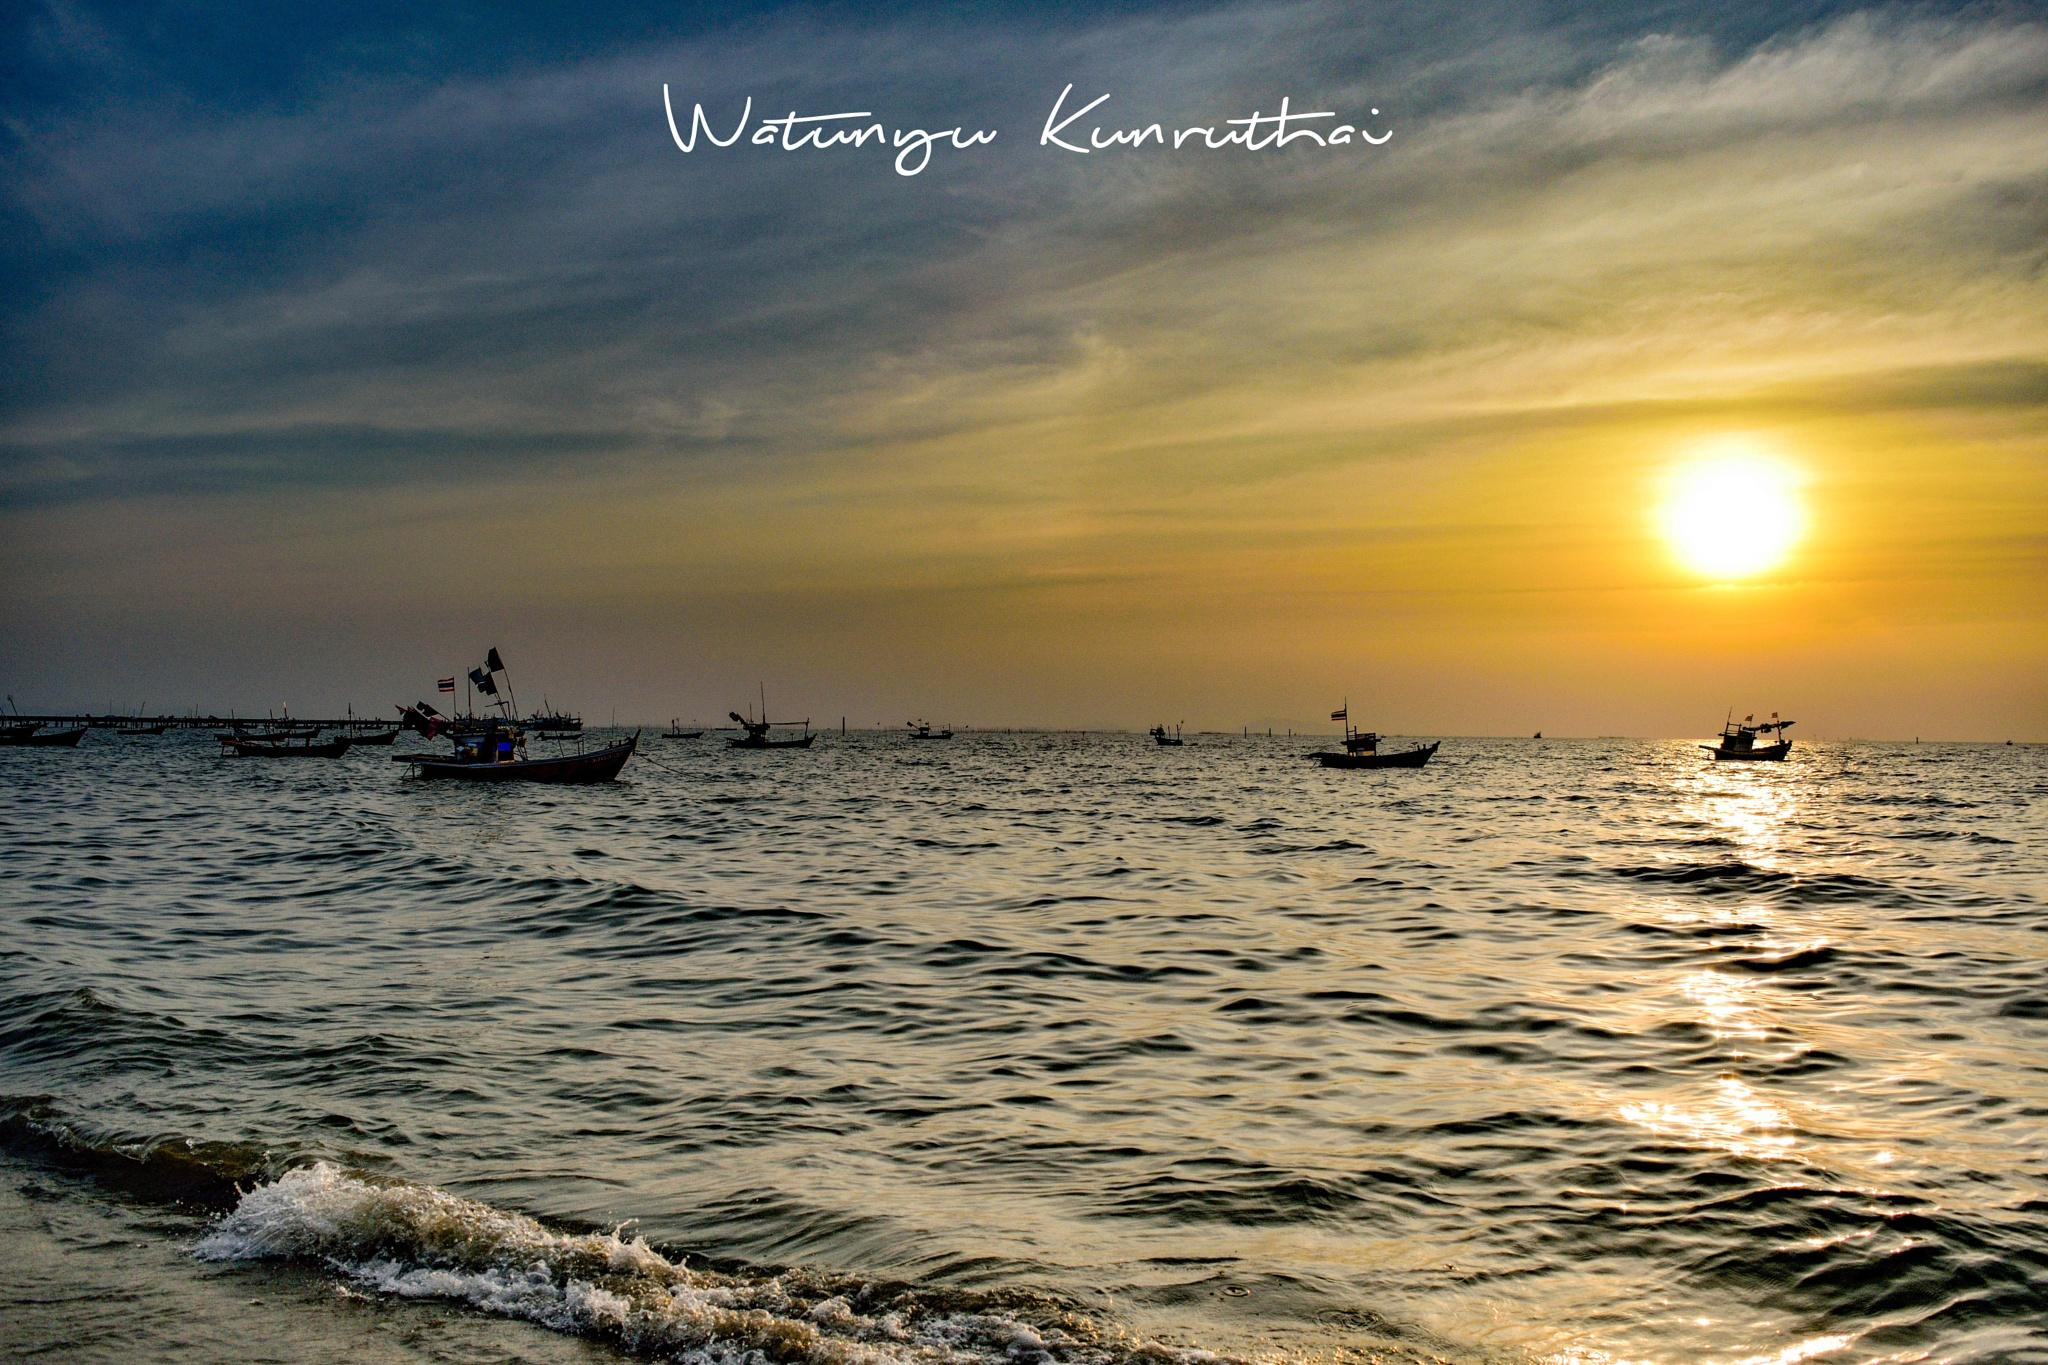 sunset at the beach  by Watunyu Kunruthai